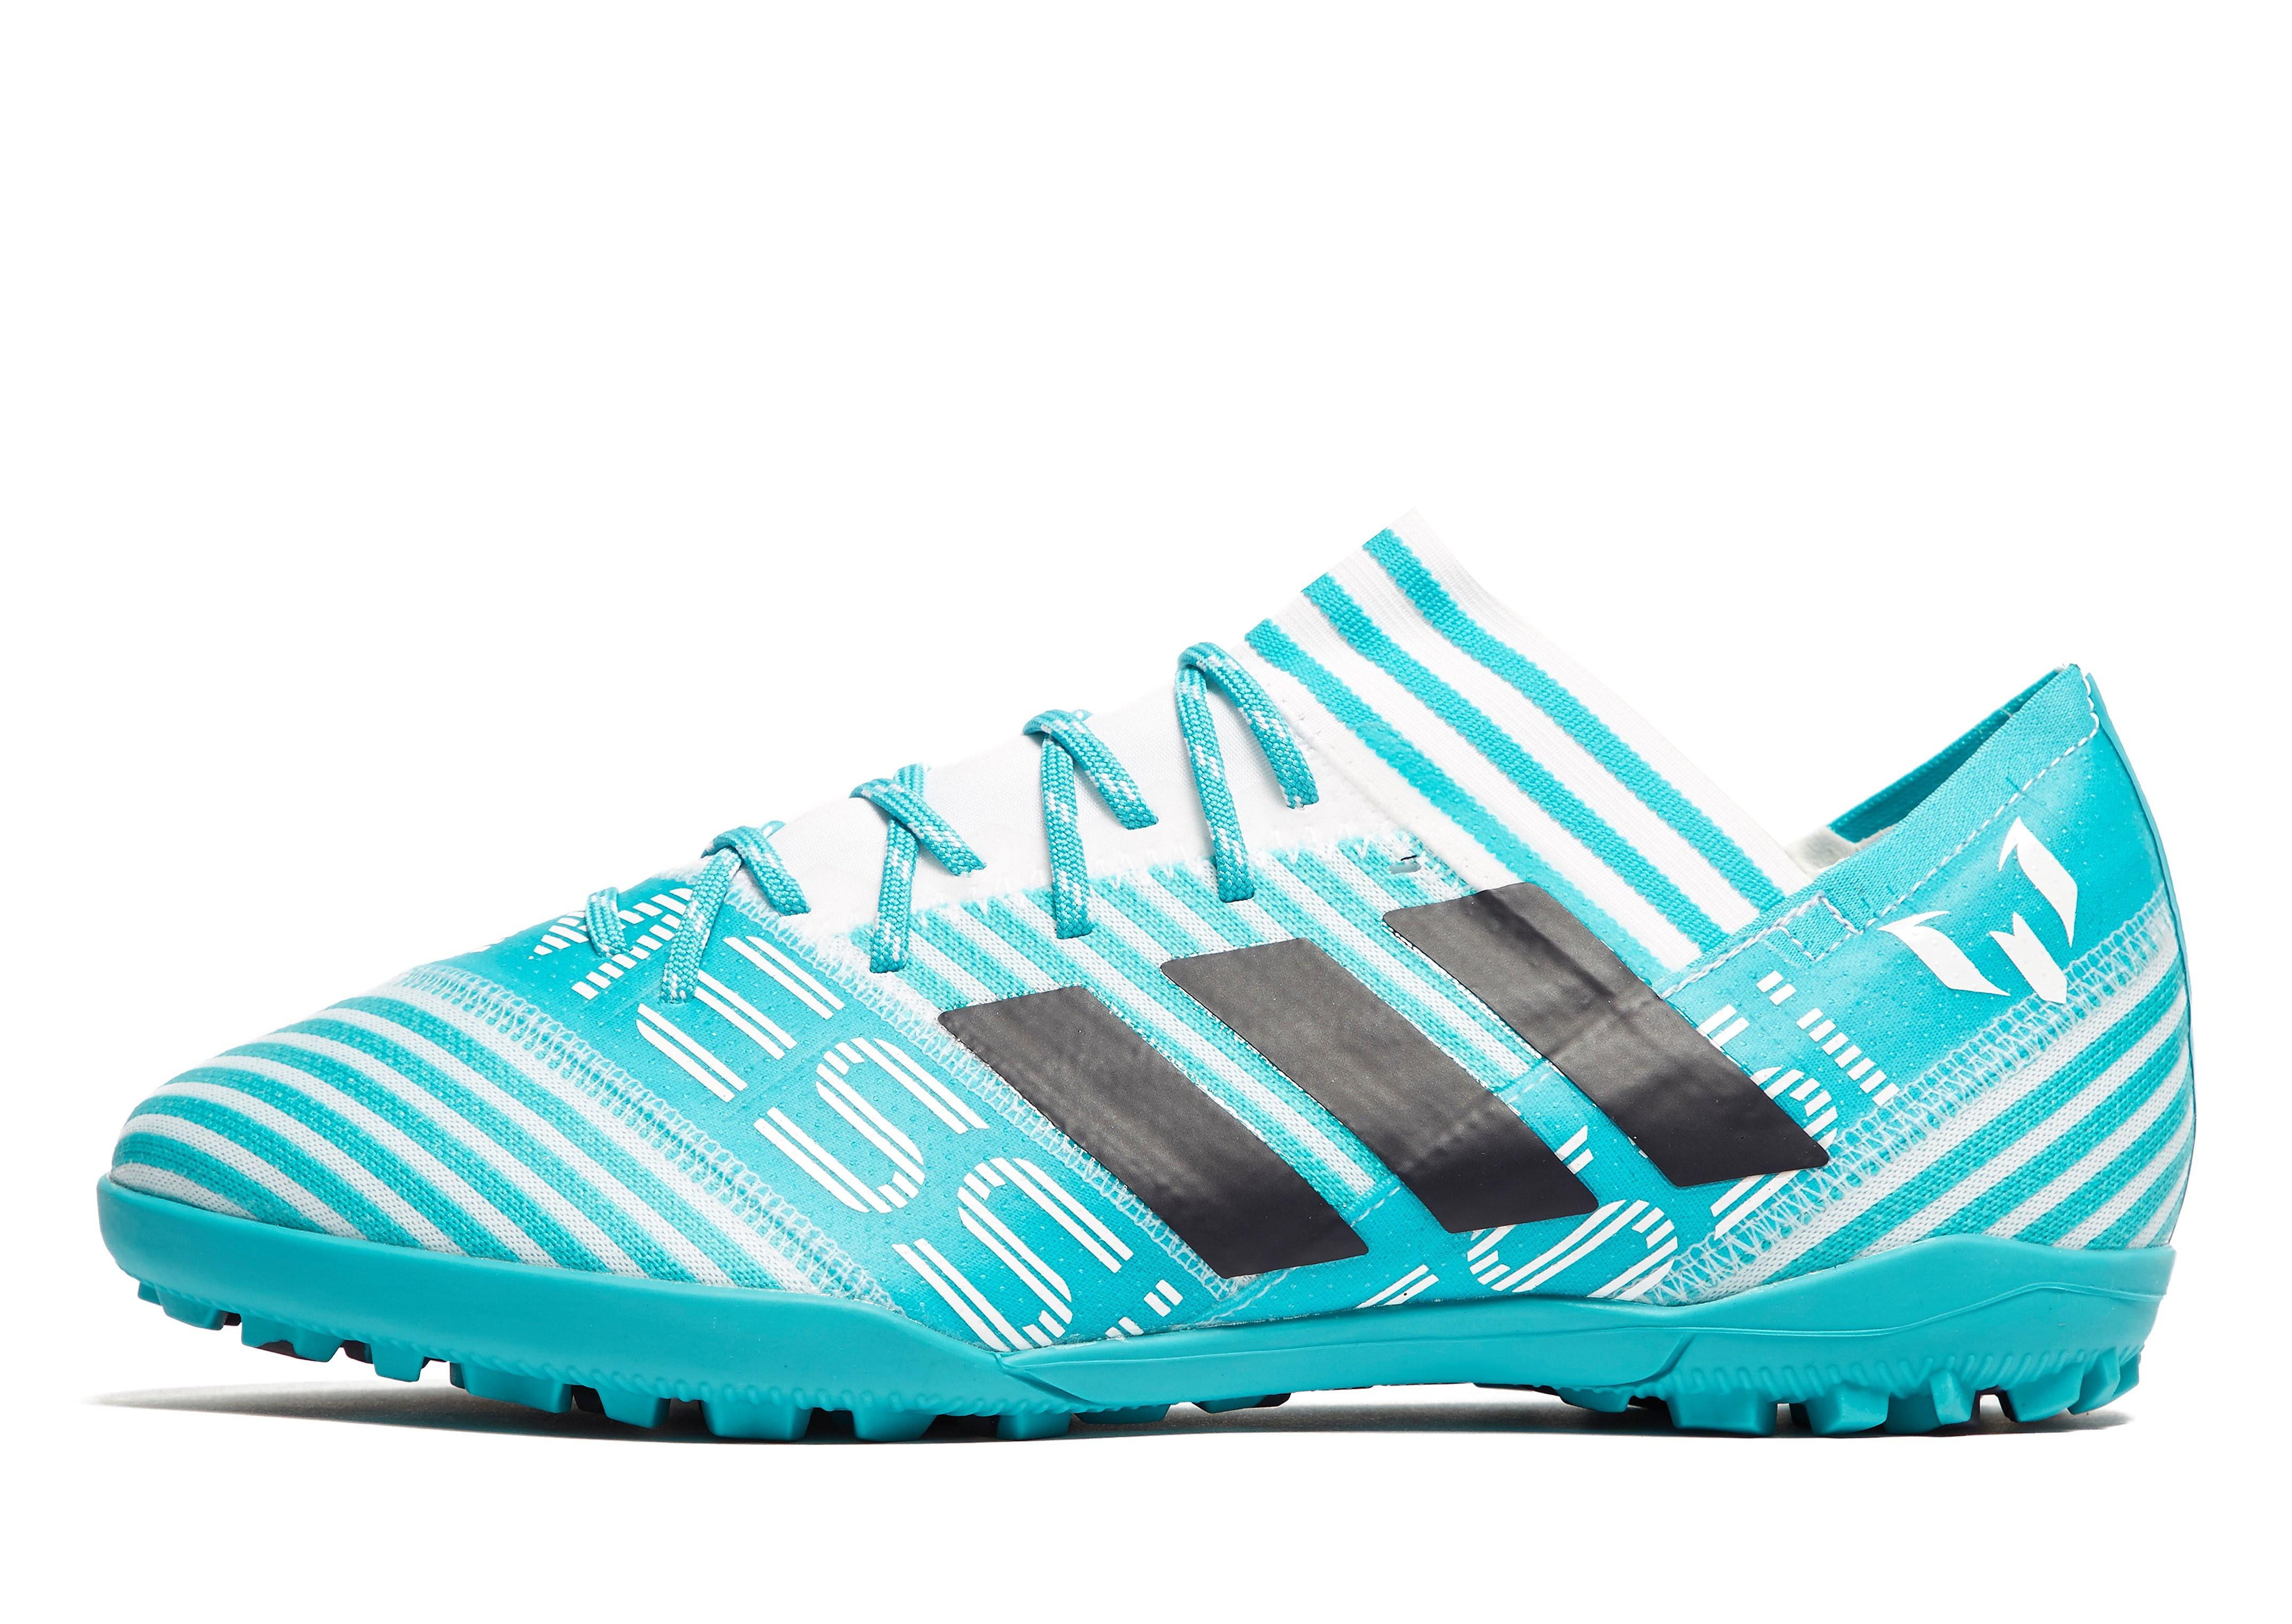 adidas Ocean Storm Nemeziz 17.3 TF Messi